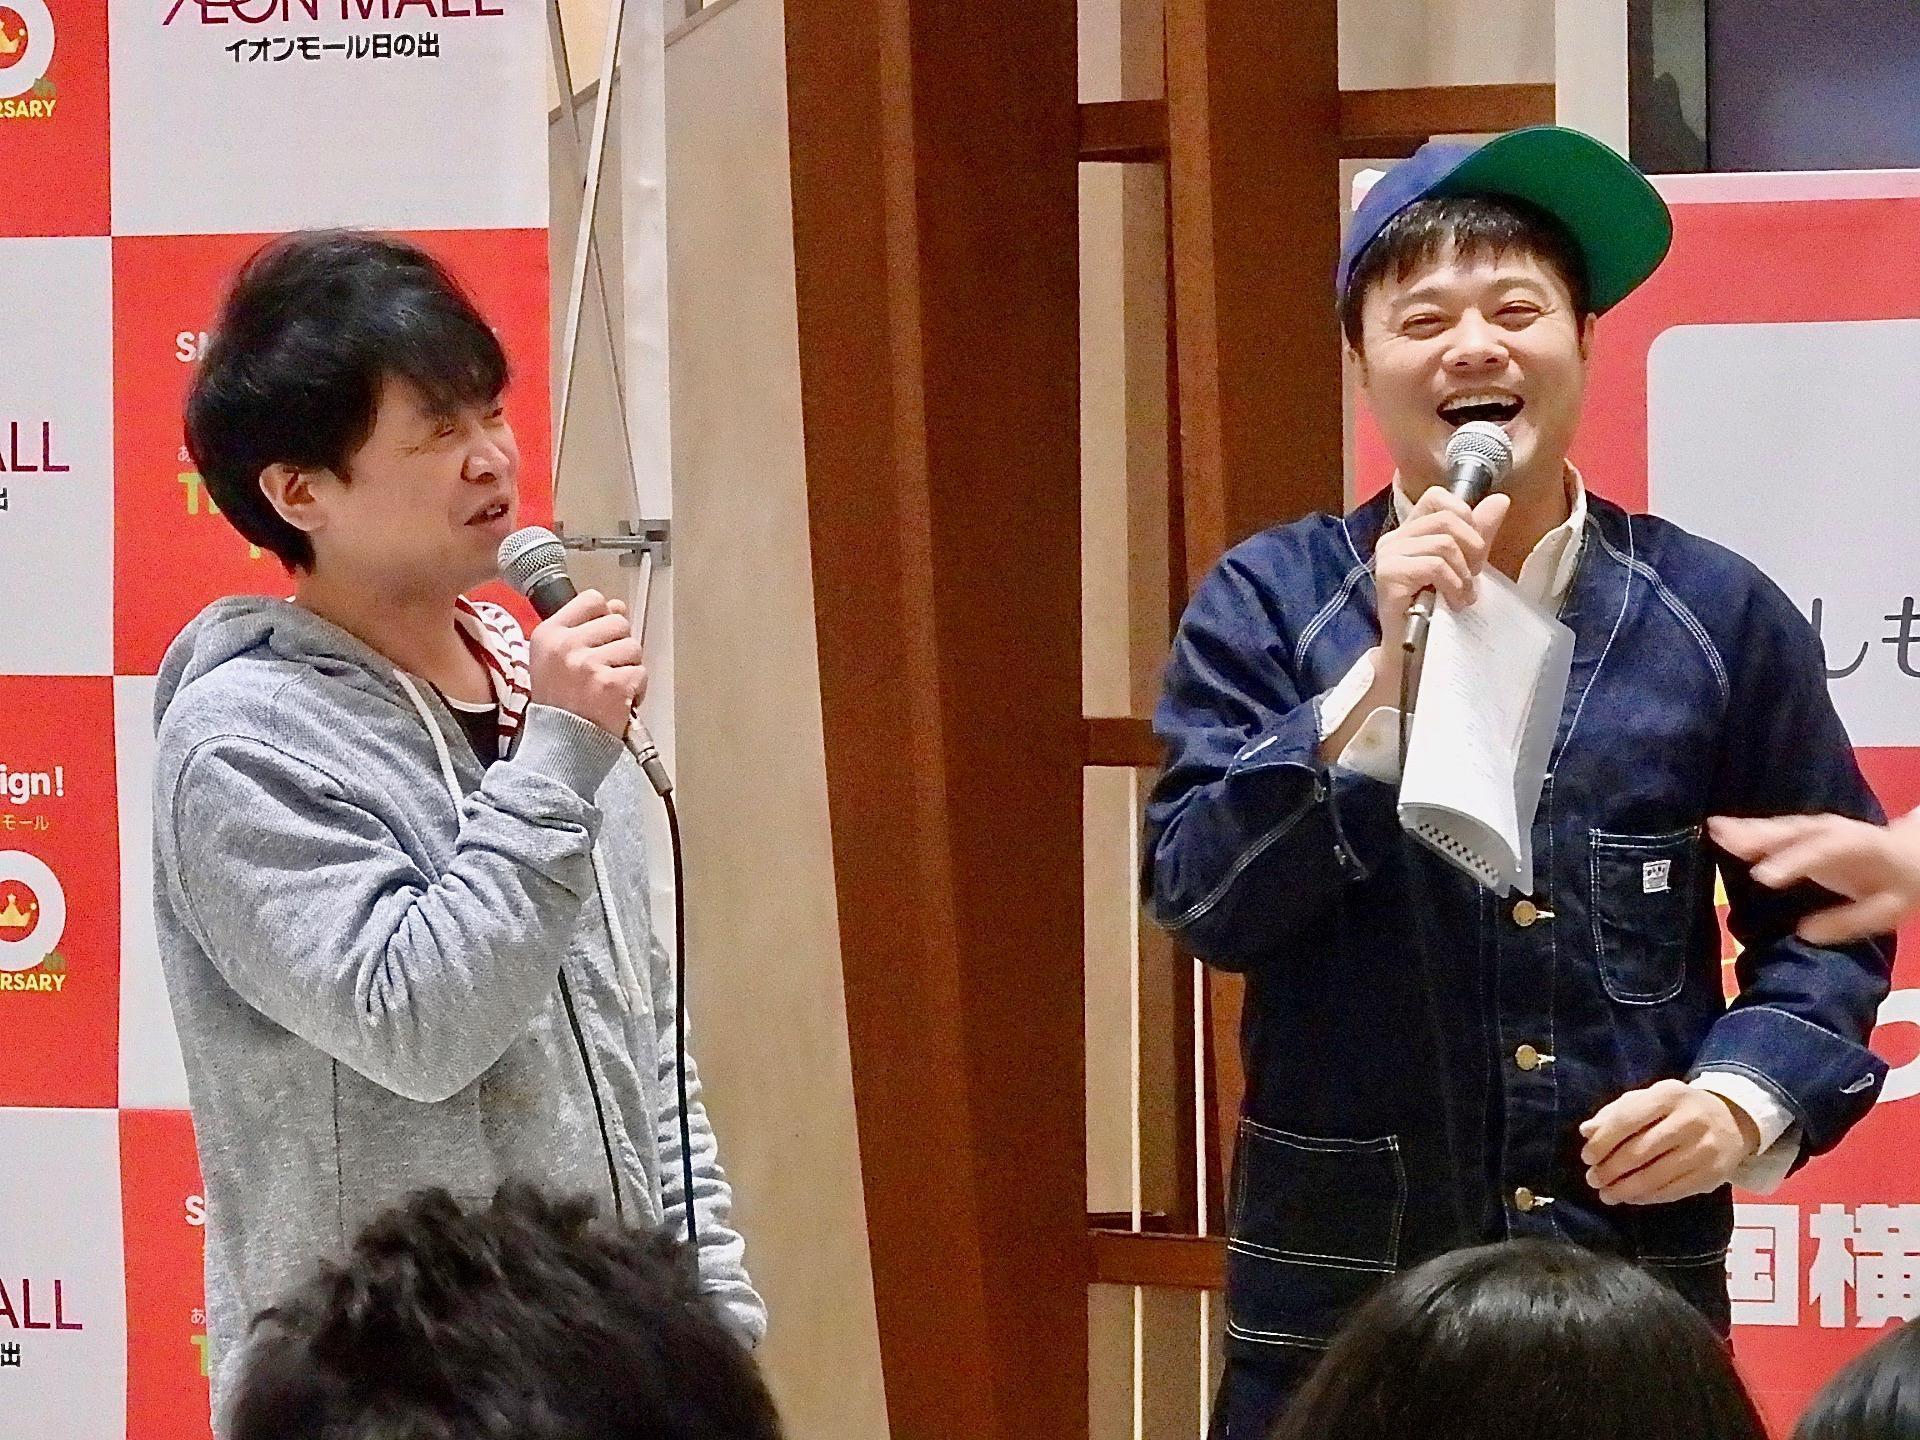 http://news.yoshimoto.co.jp/20180211194425-56f72f5773105f70492ae95a29cdb5439d9576de.jpg